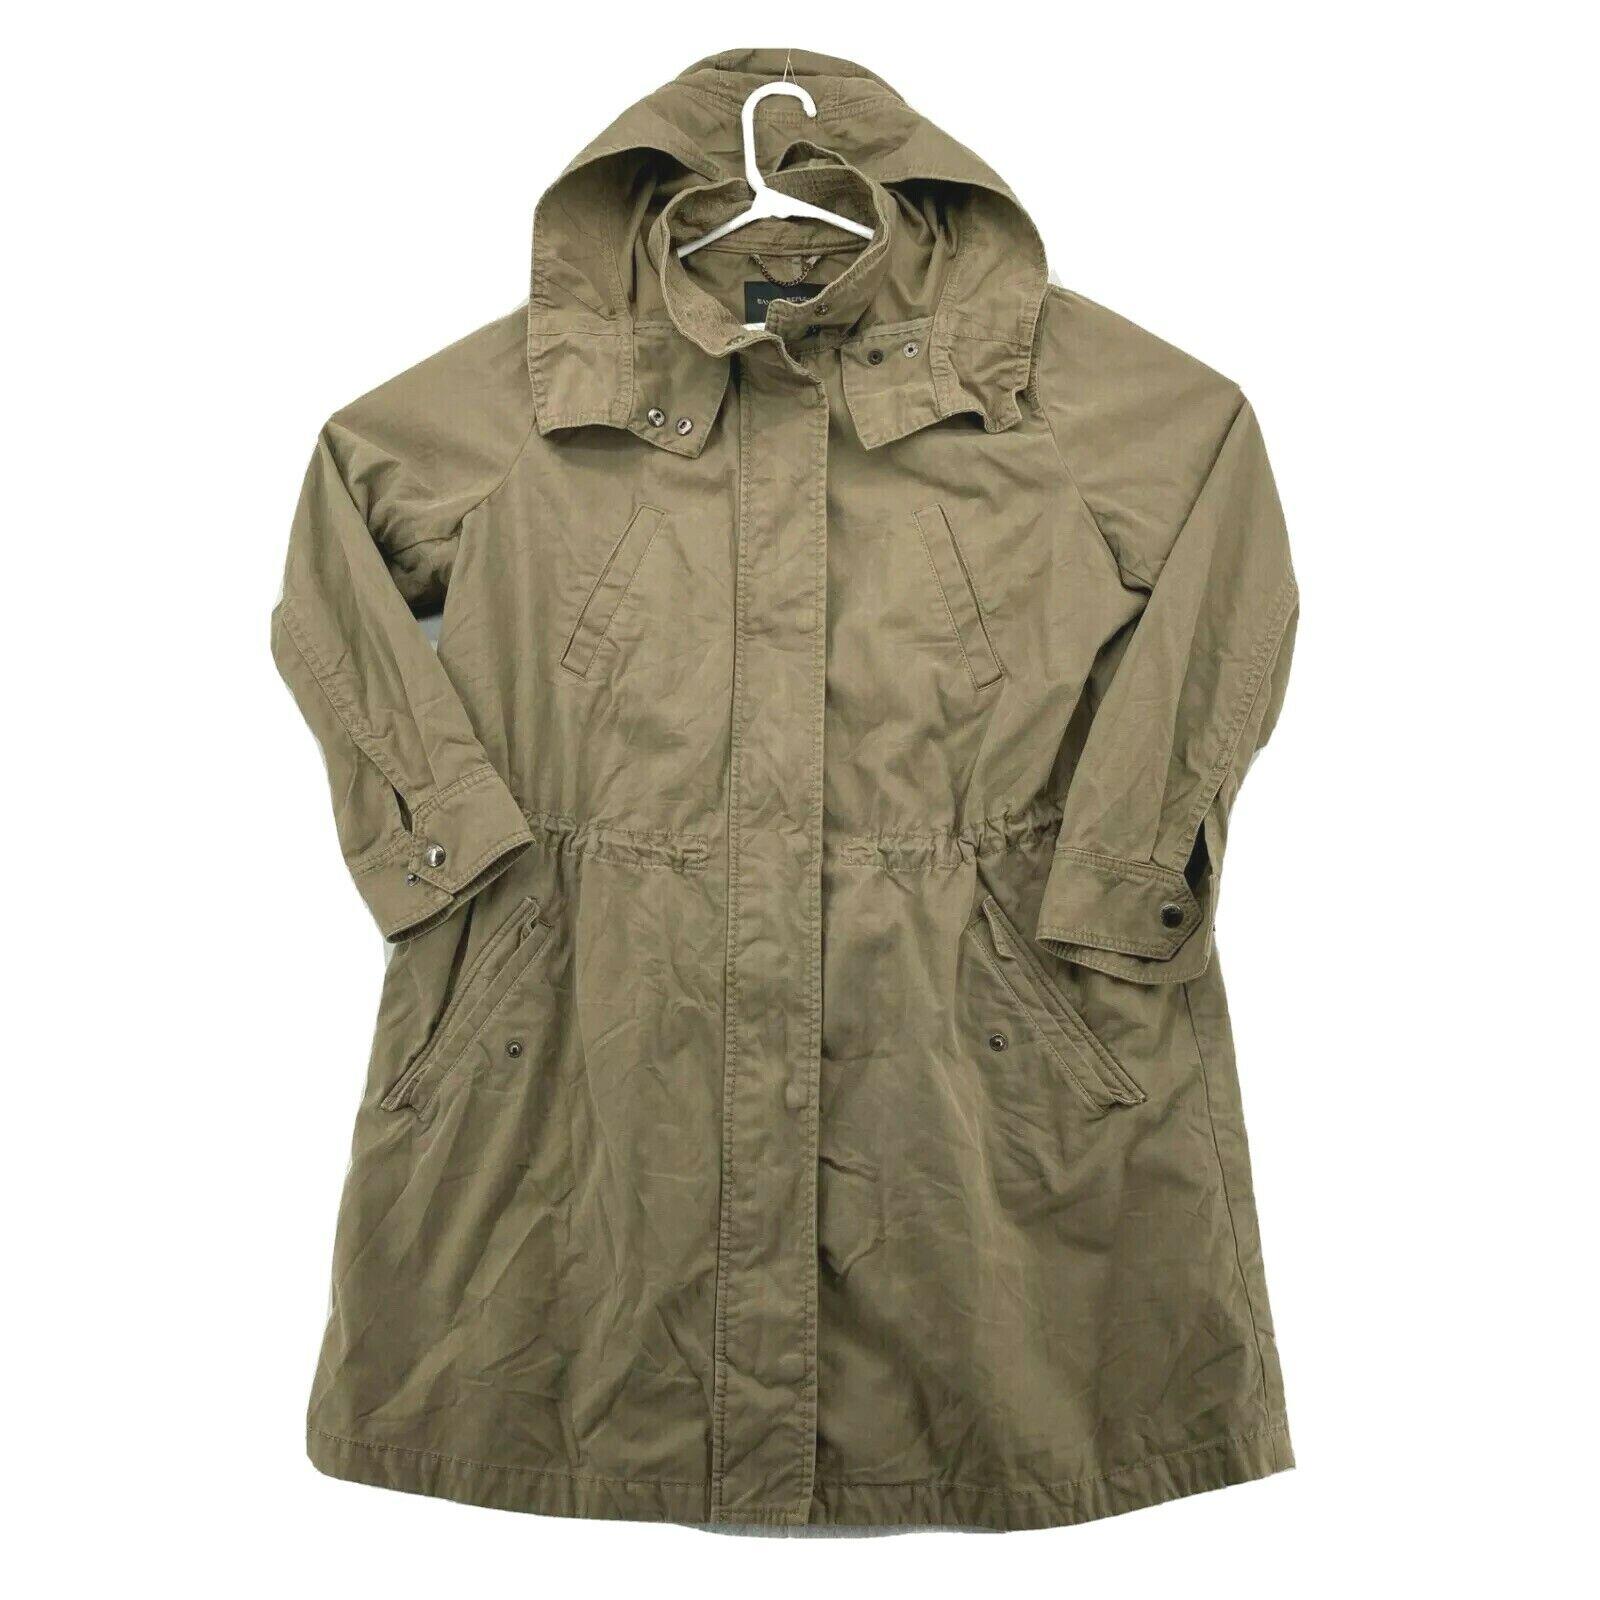 Banana Republic Womens Long Sleeve Front Pockets Solid Tan Hooded Jacket Size M